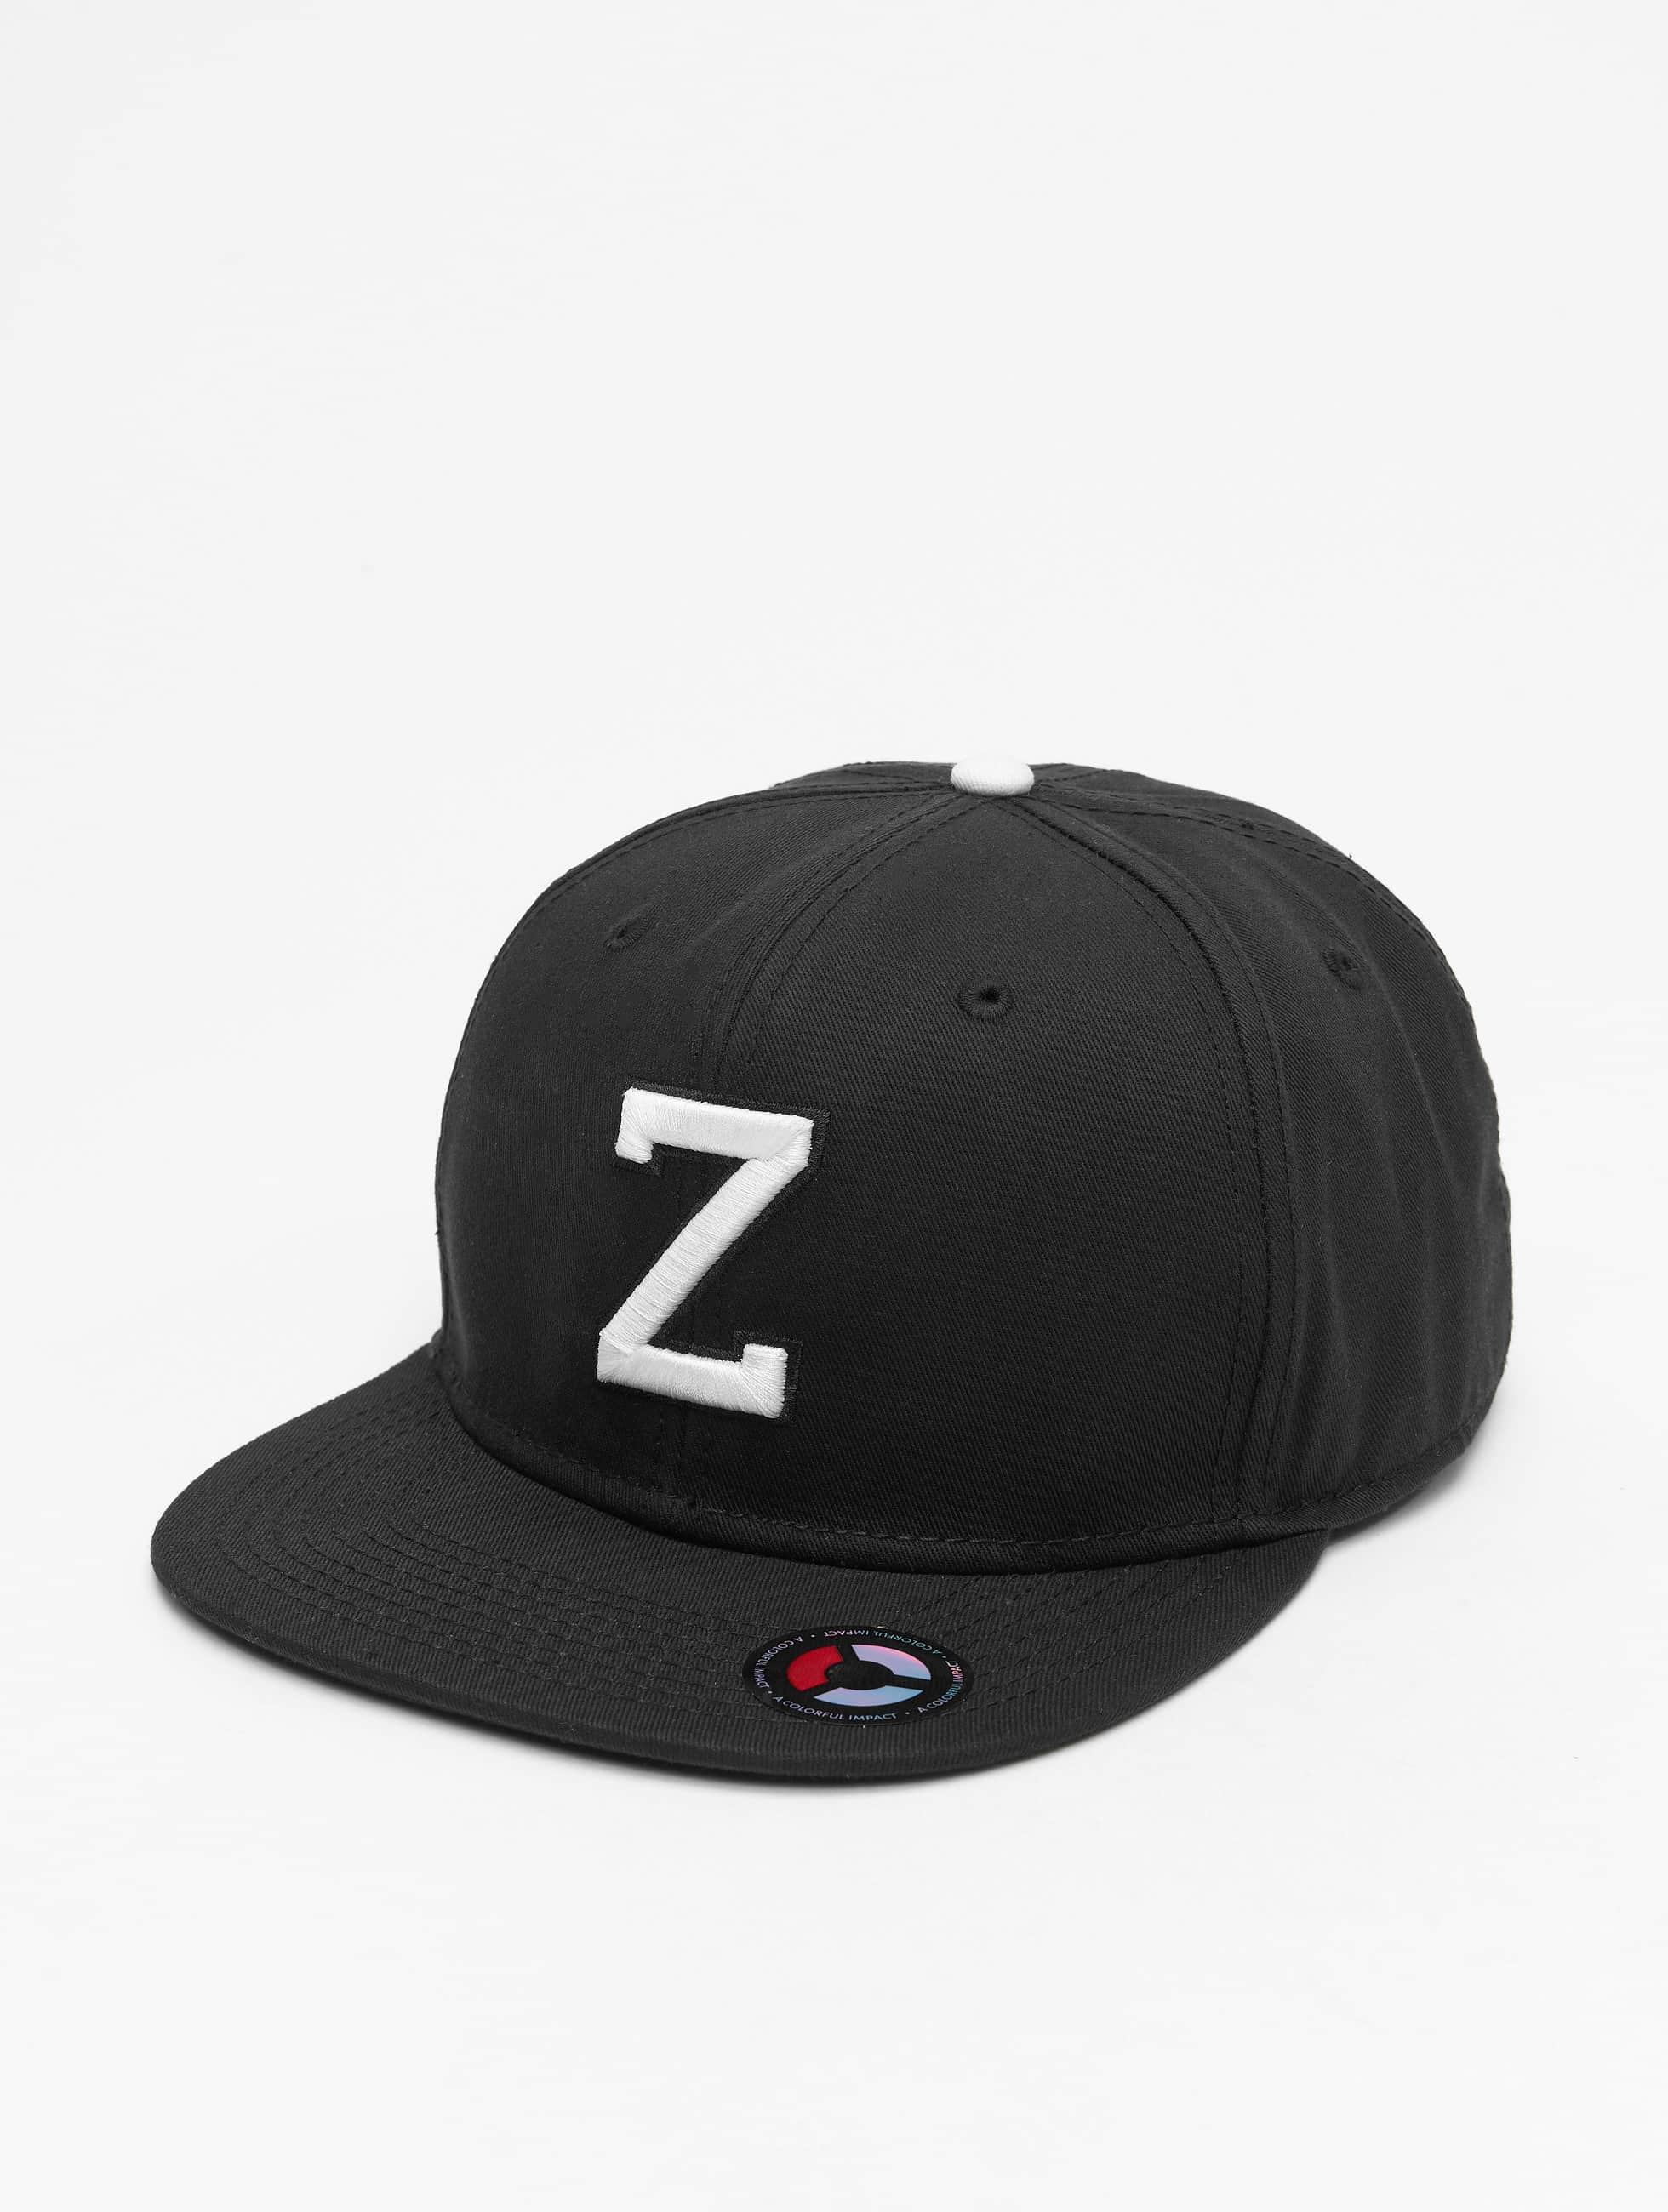 MSTRDS Snapback Caps Z Lette musta